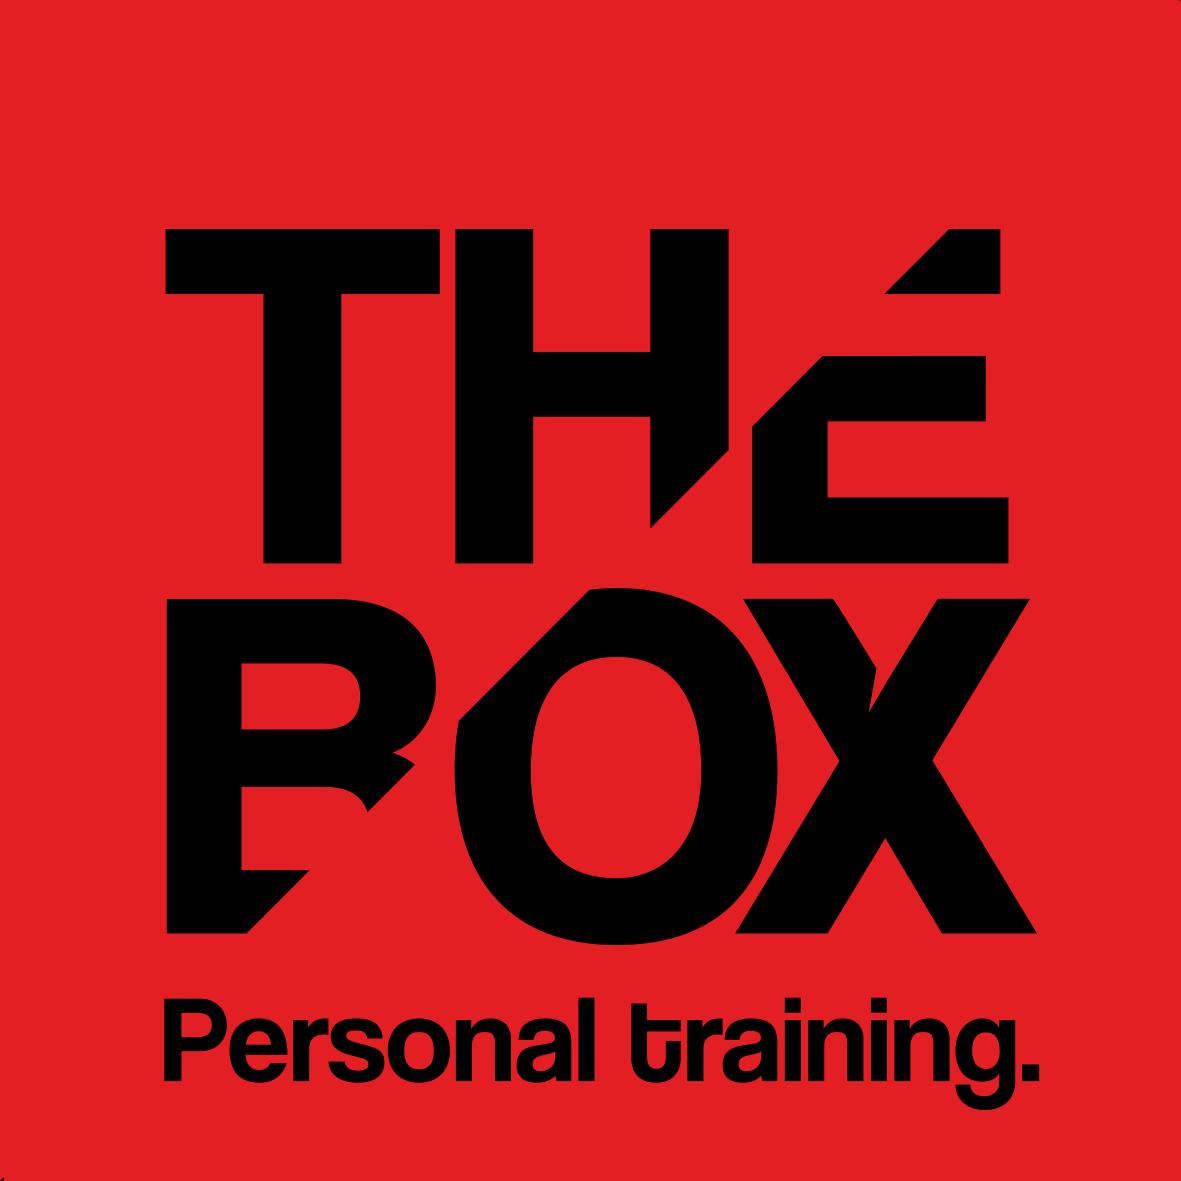 Sports performance & Personal coaching